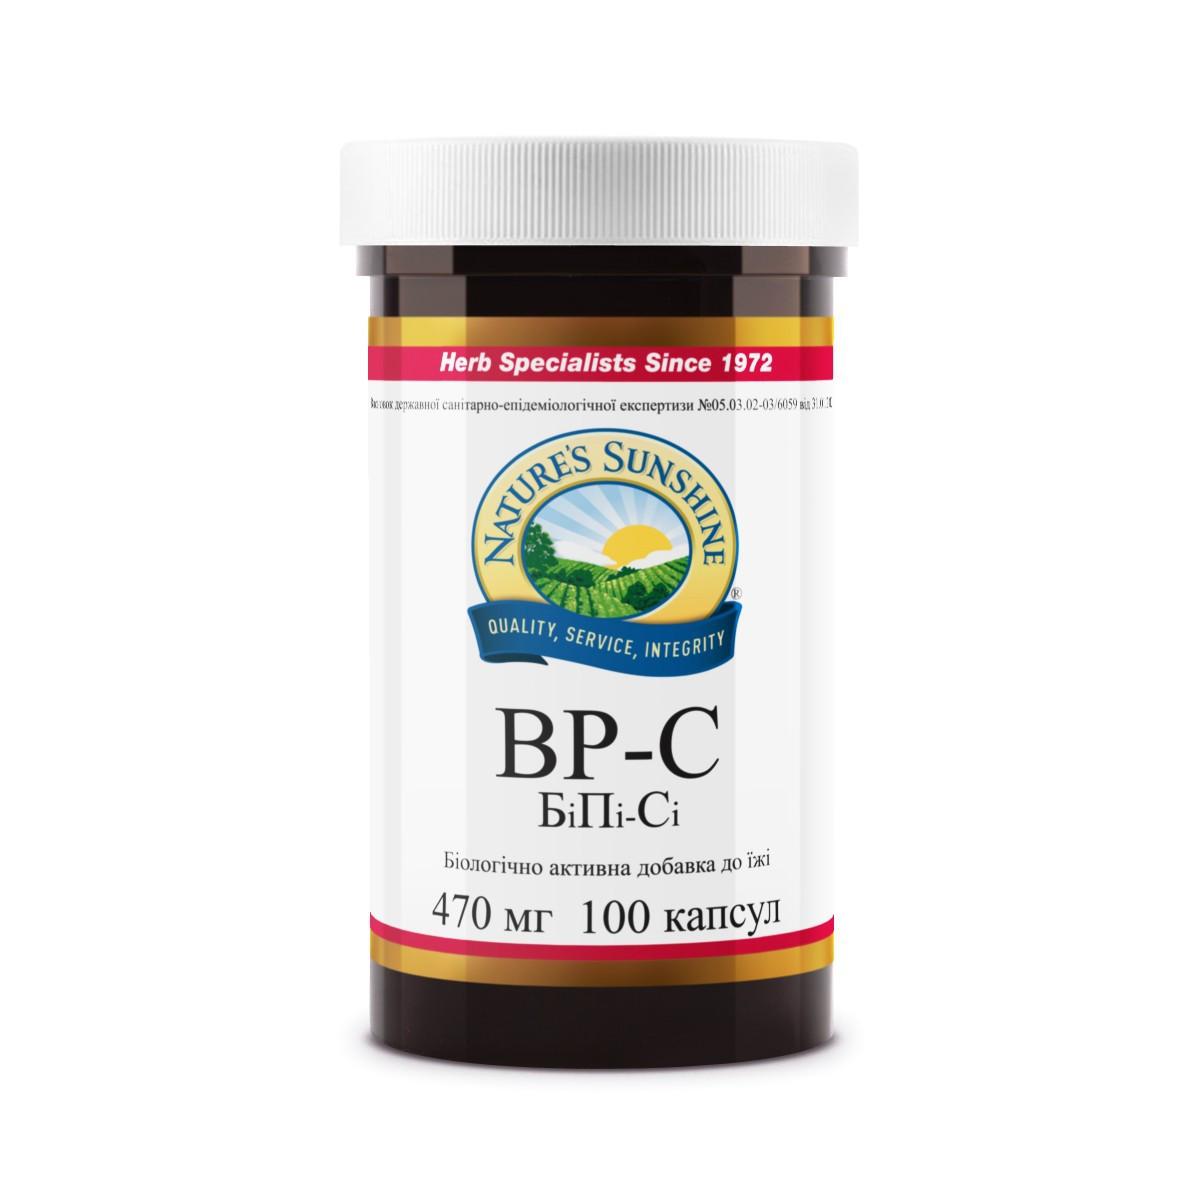 Добавка BP-C Би Пи-Си  для сердца, 100 капсул, NSP, НСП, США.